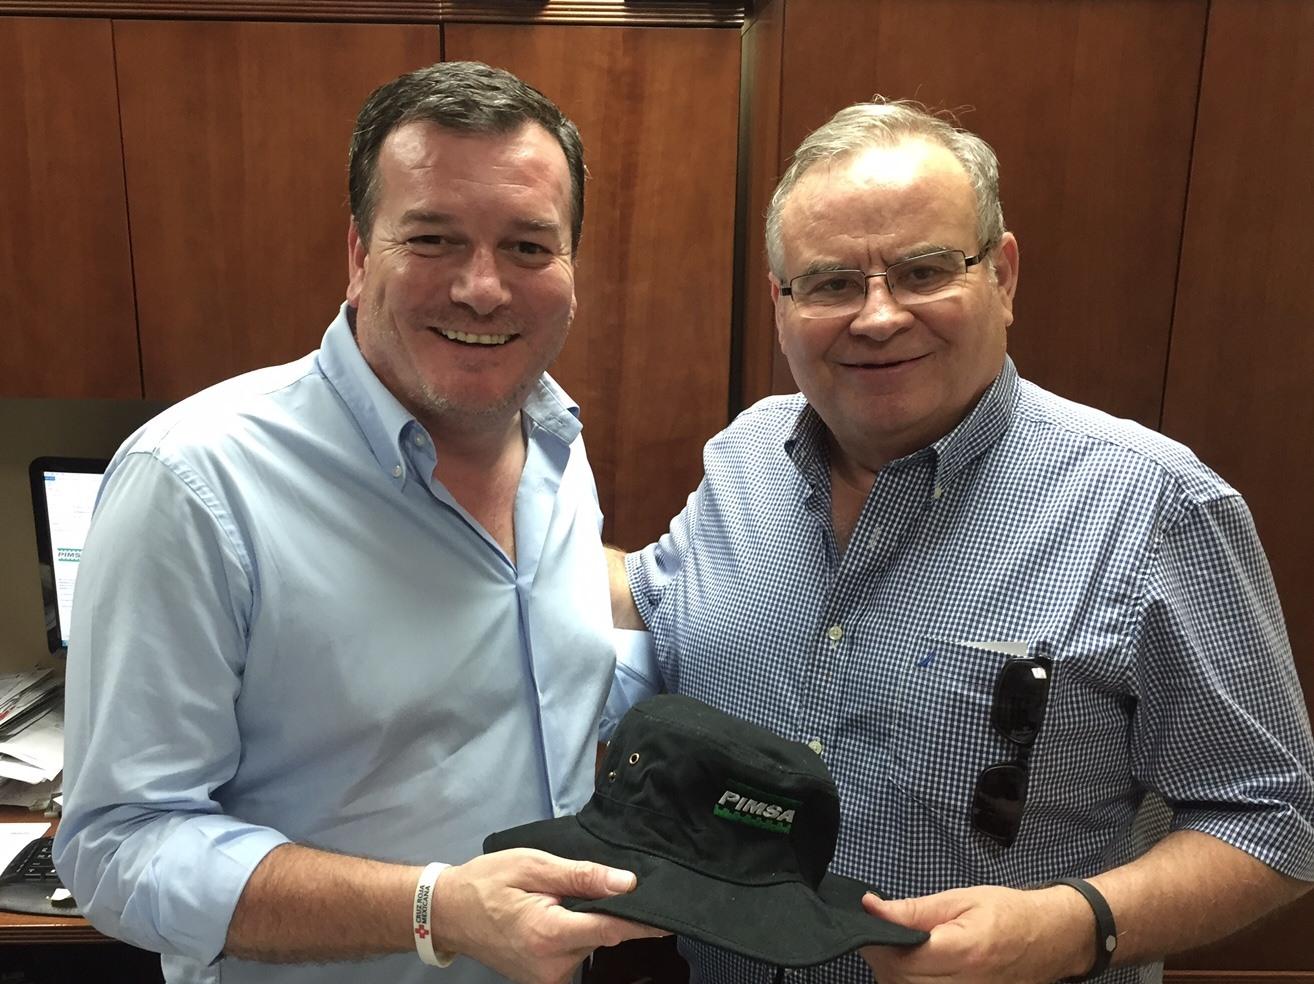 John Renison and Francisco Fiorentini - PIMSA INDUSTRIAL PARKS IN MEXICO